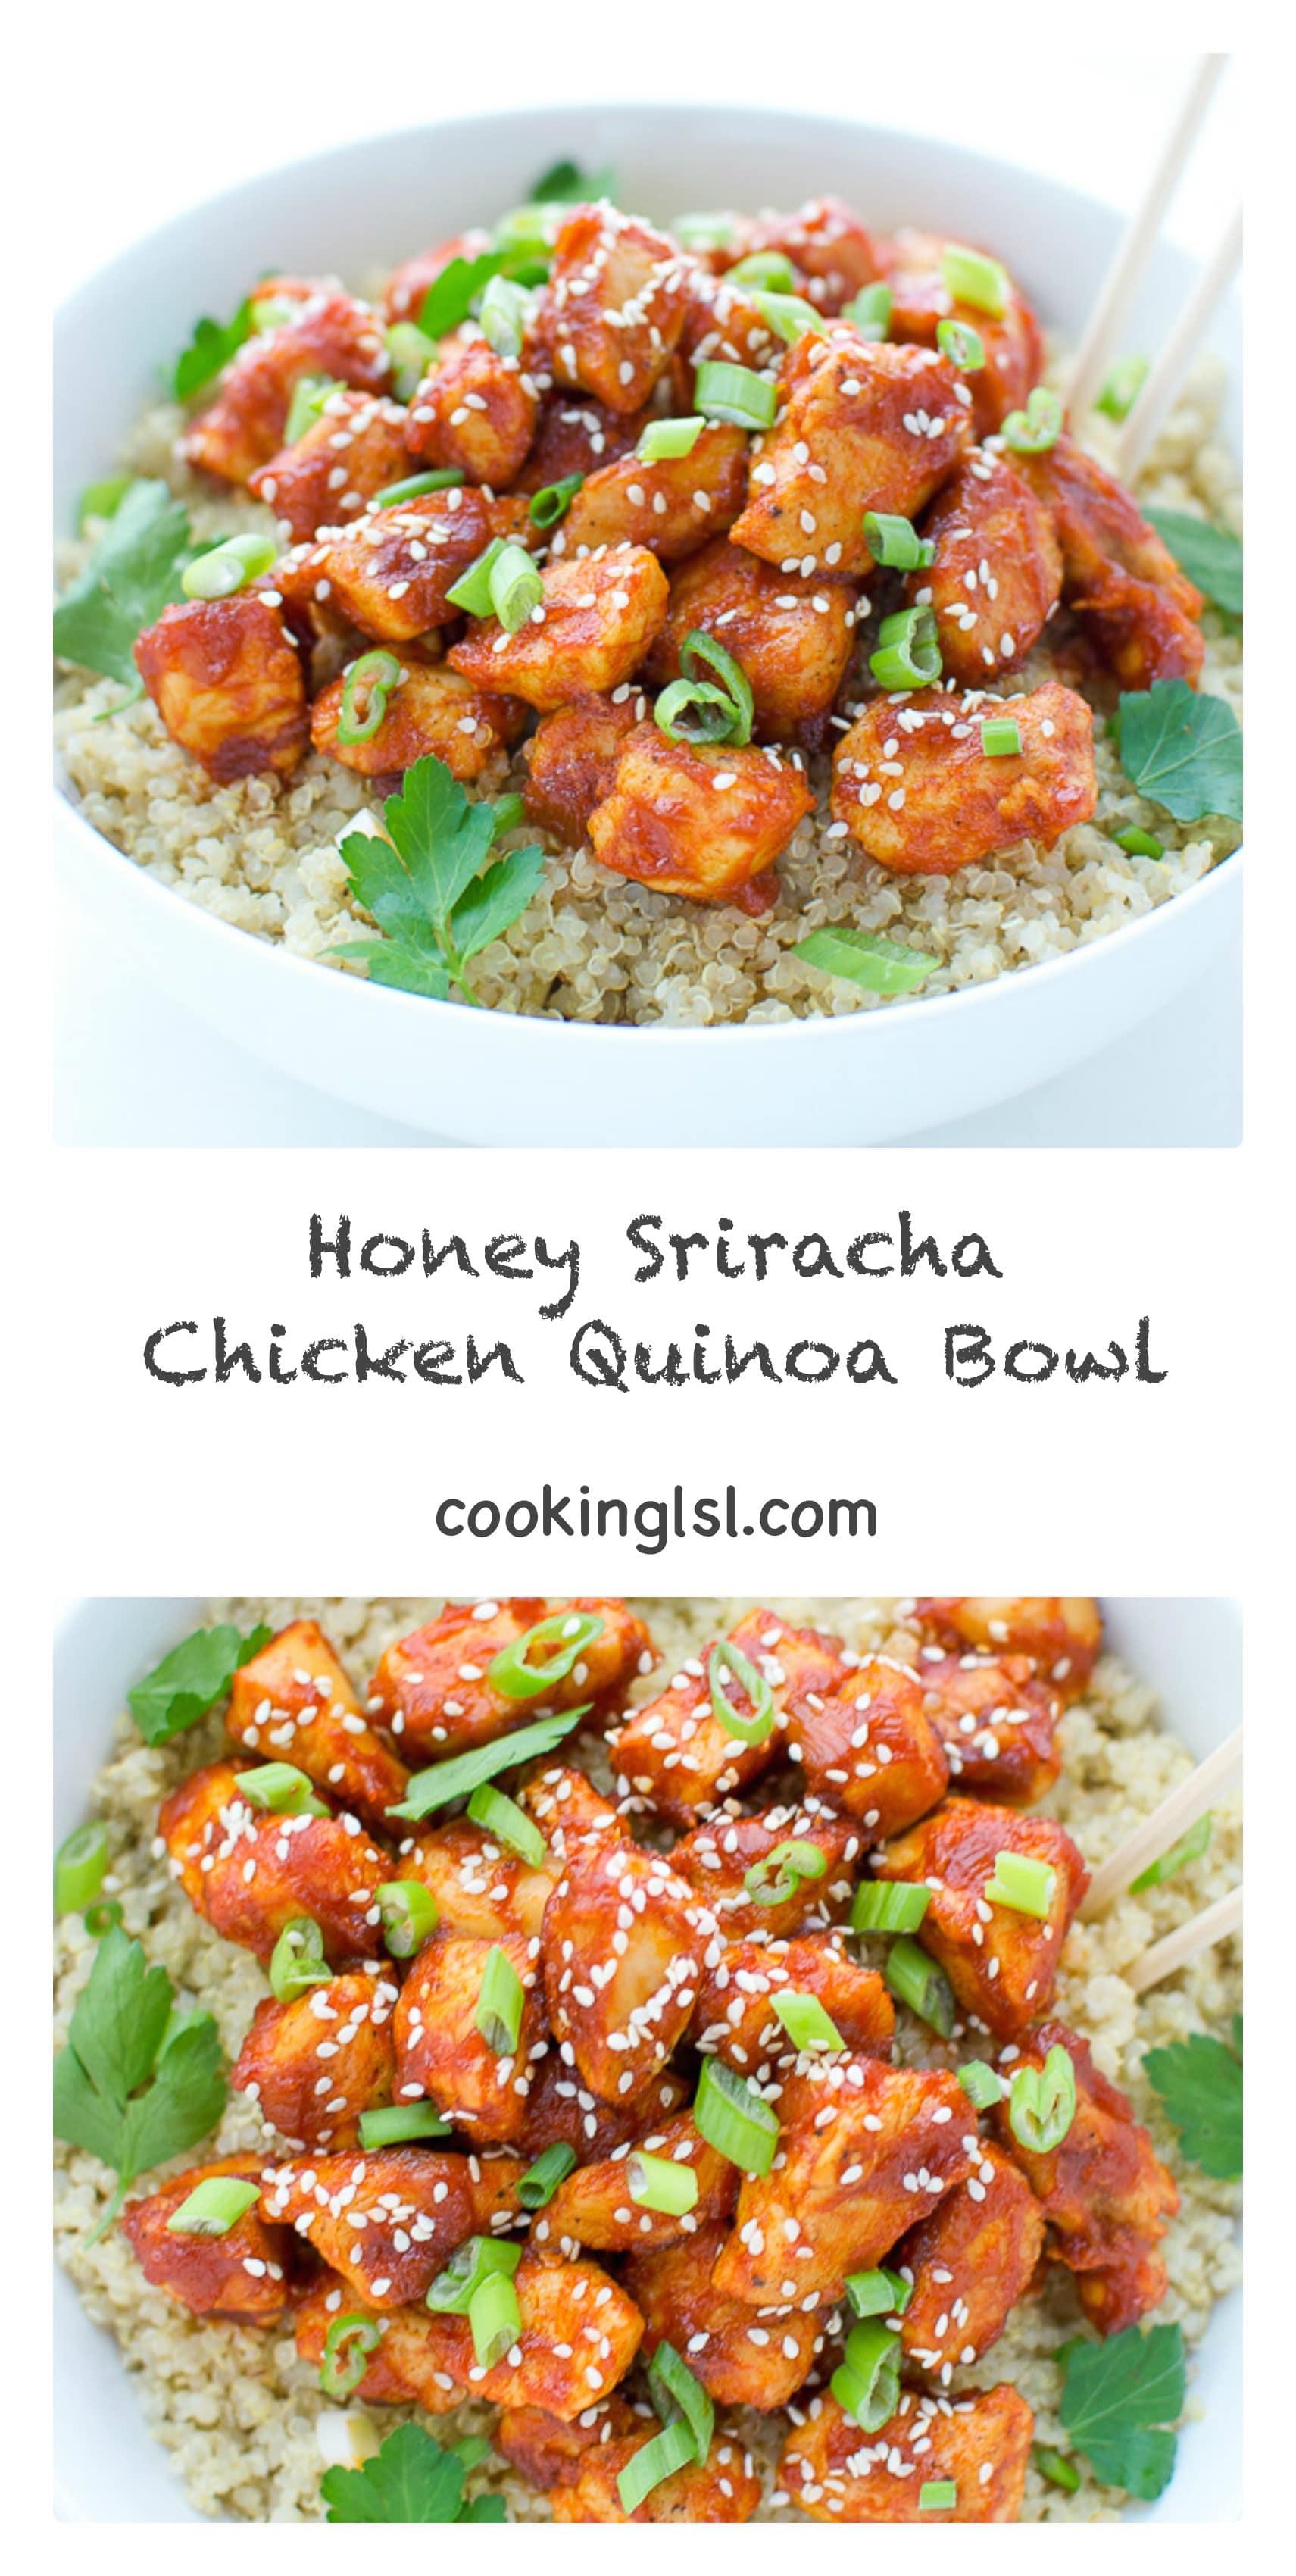 honey-sriracha-chicken-quinoa-bowl